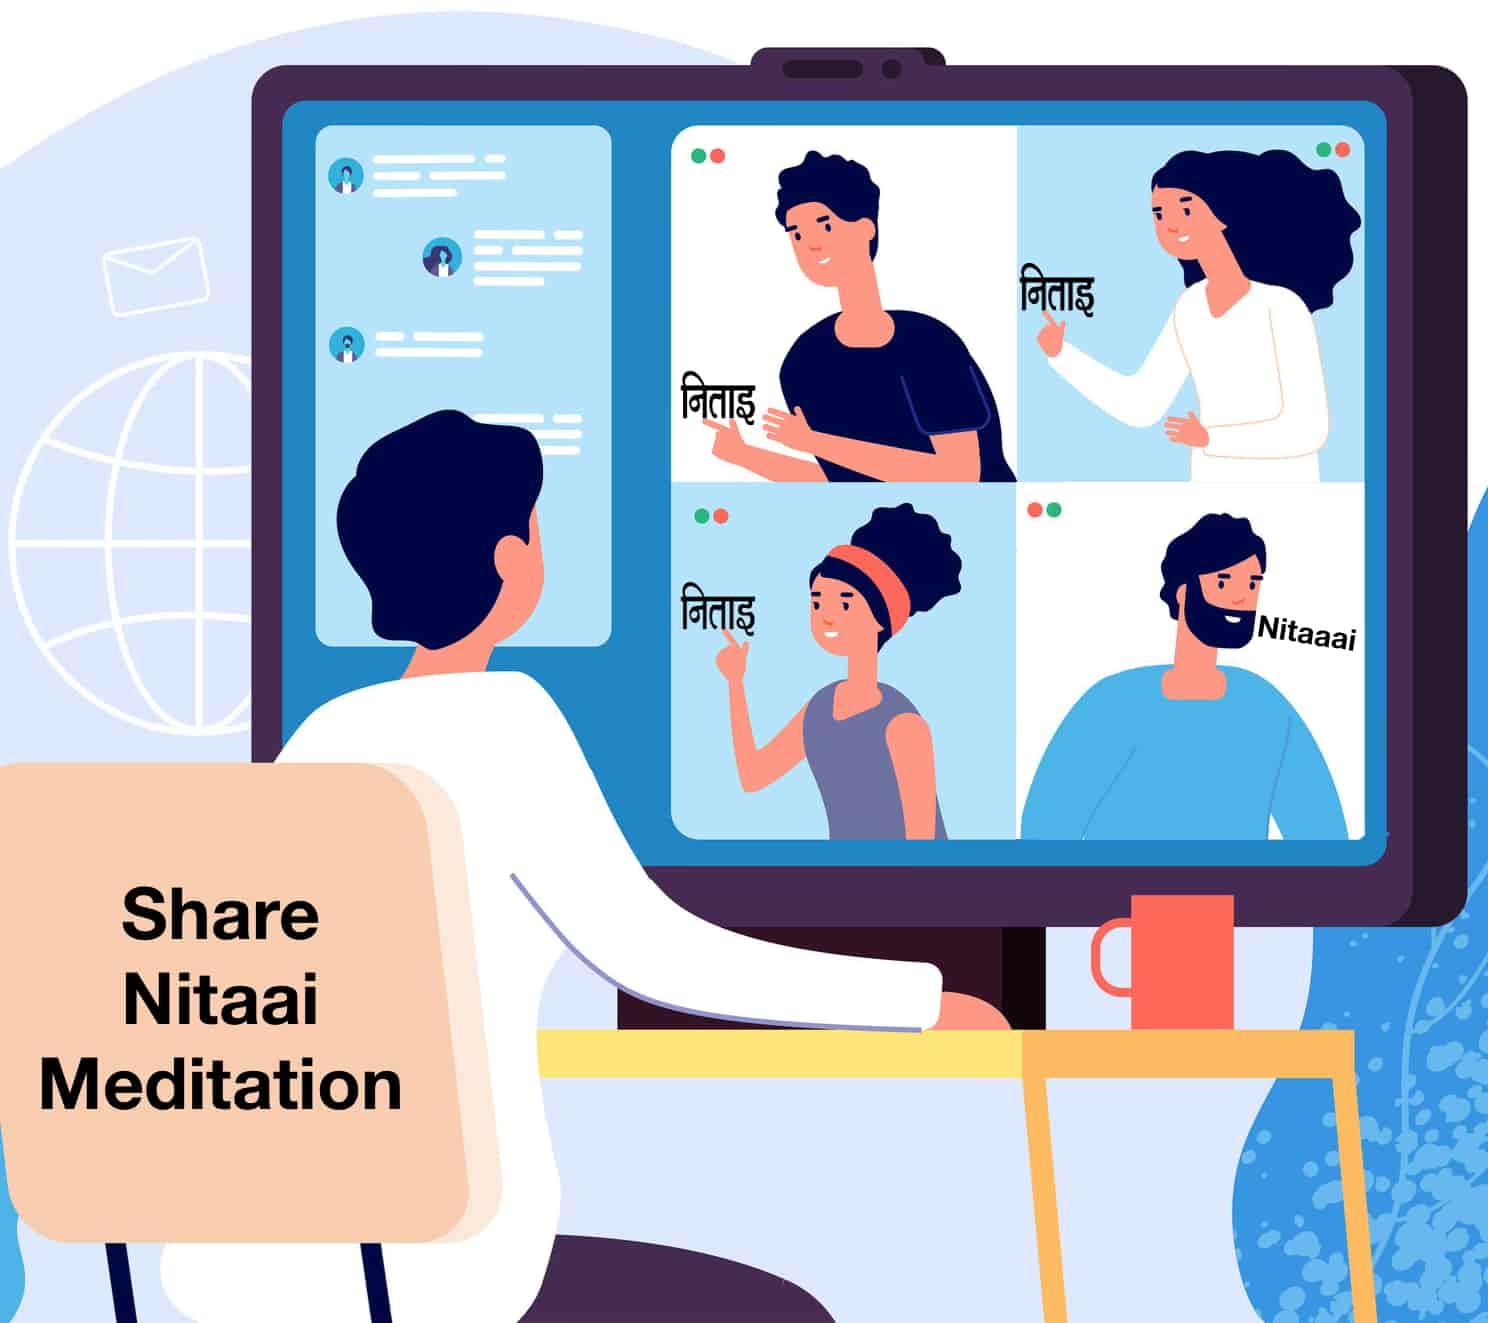 Share Nitaai Meditation